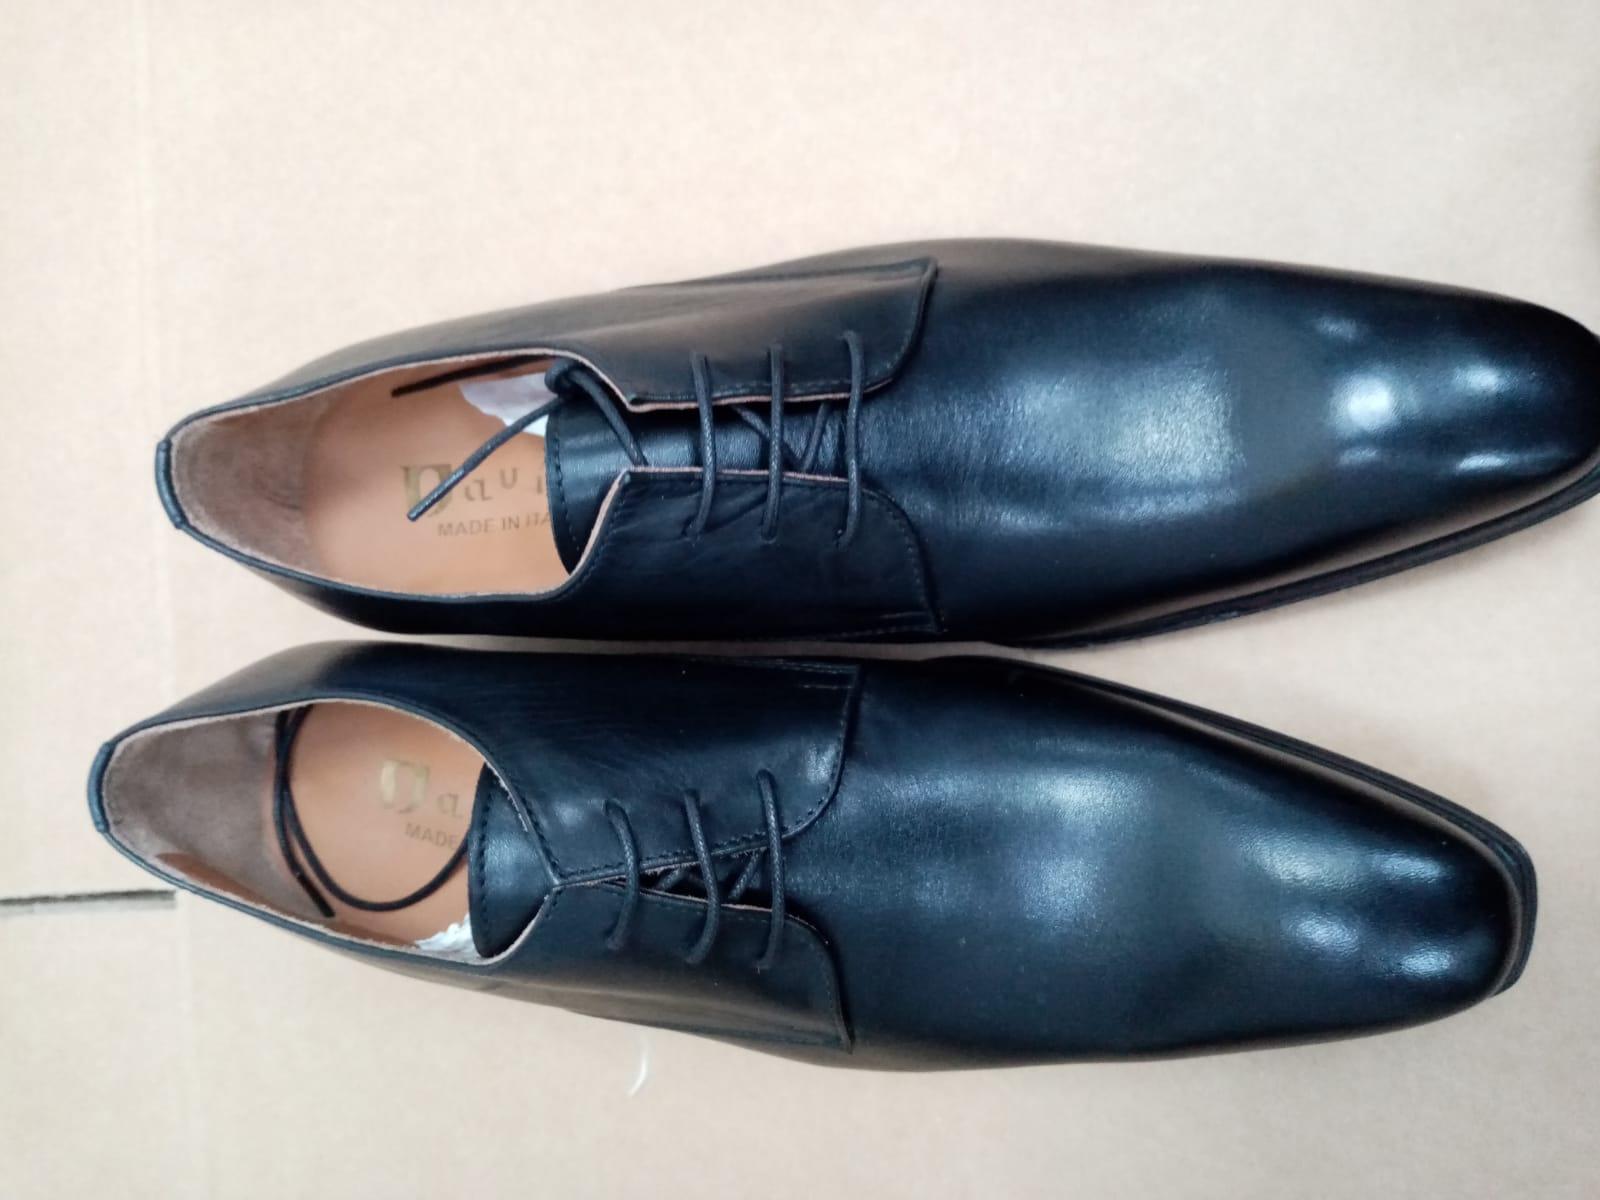 Quality Italian business men shoe